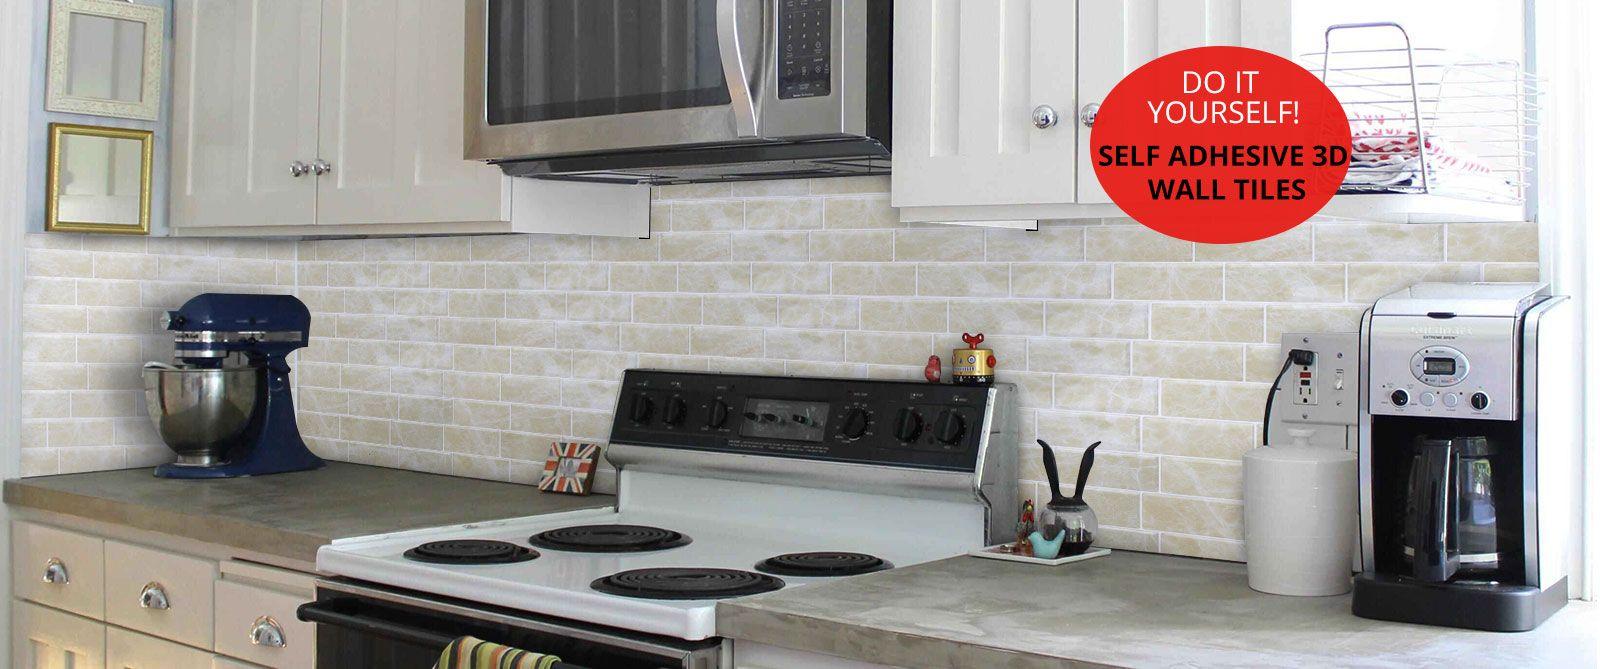 Self Adhesive 3d Wall Tiles For Kitchen Backsplash Kitchen Wall